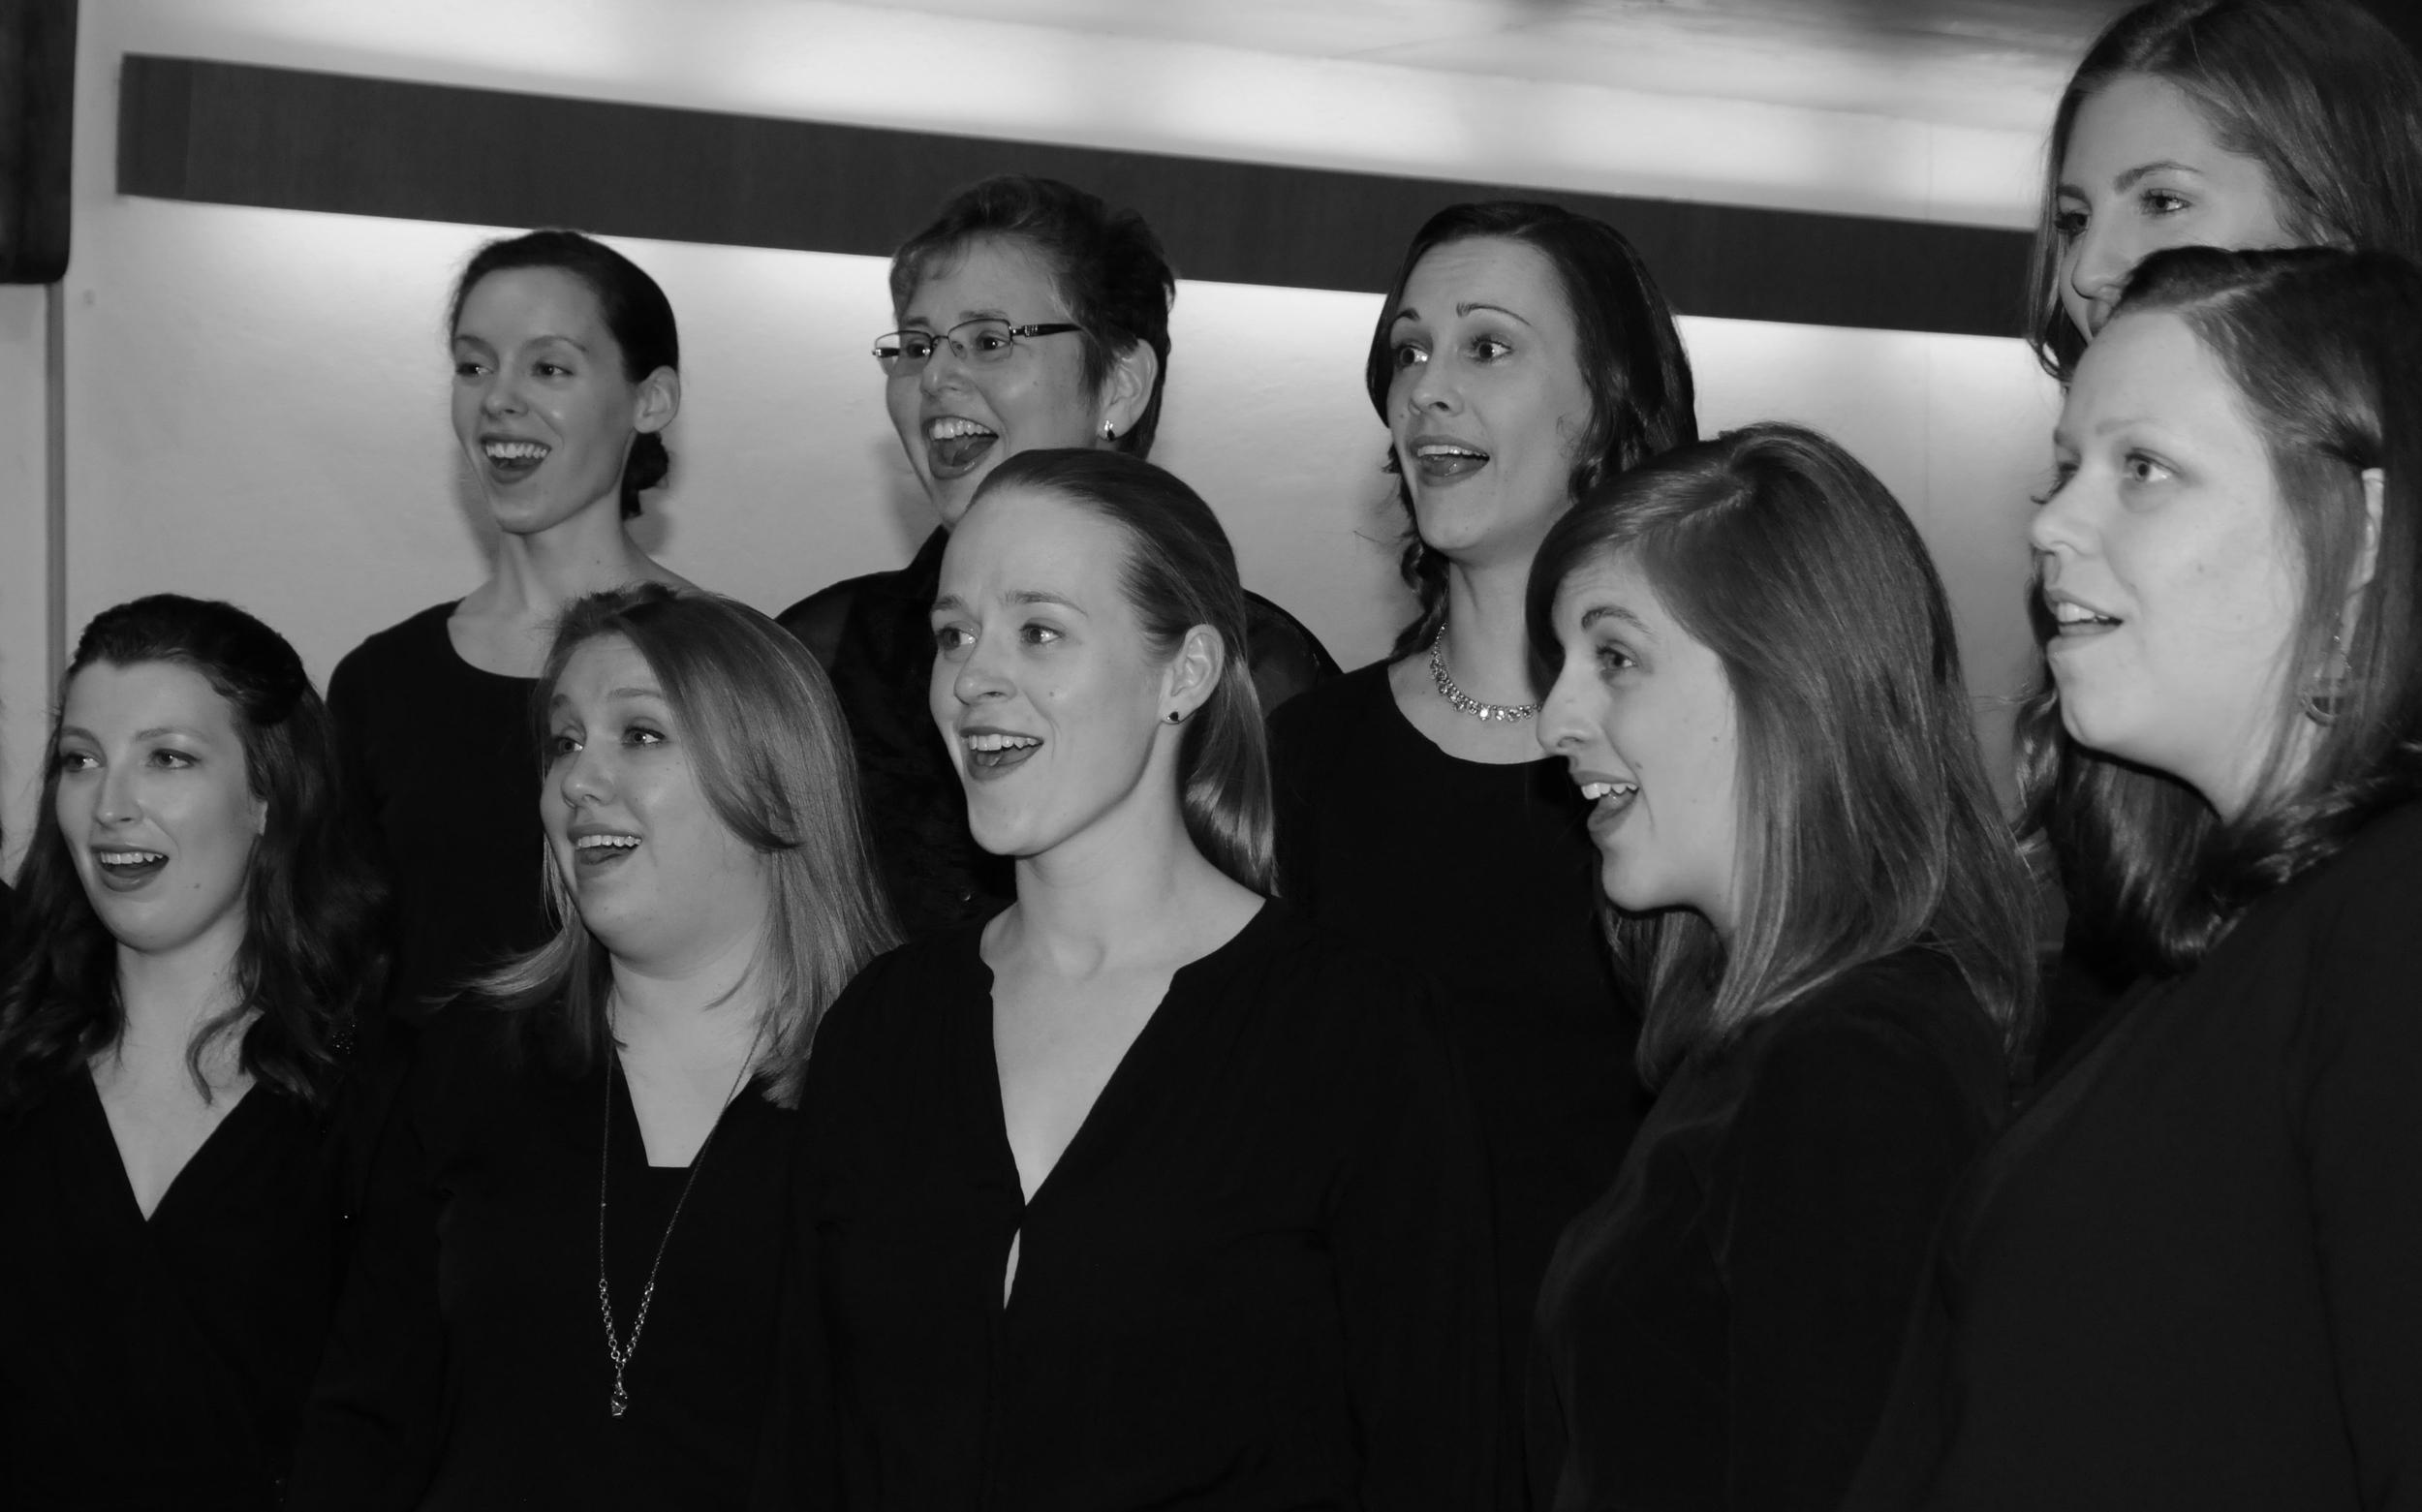 cantala-womens-choir-zimfira-poloz-blog